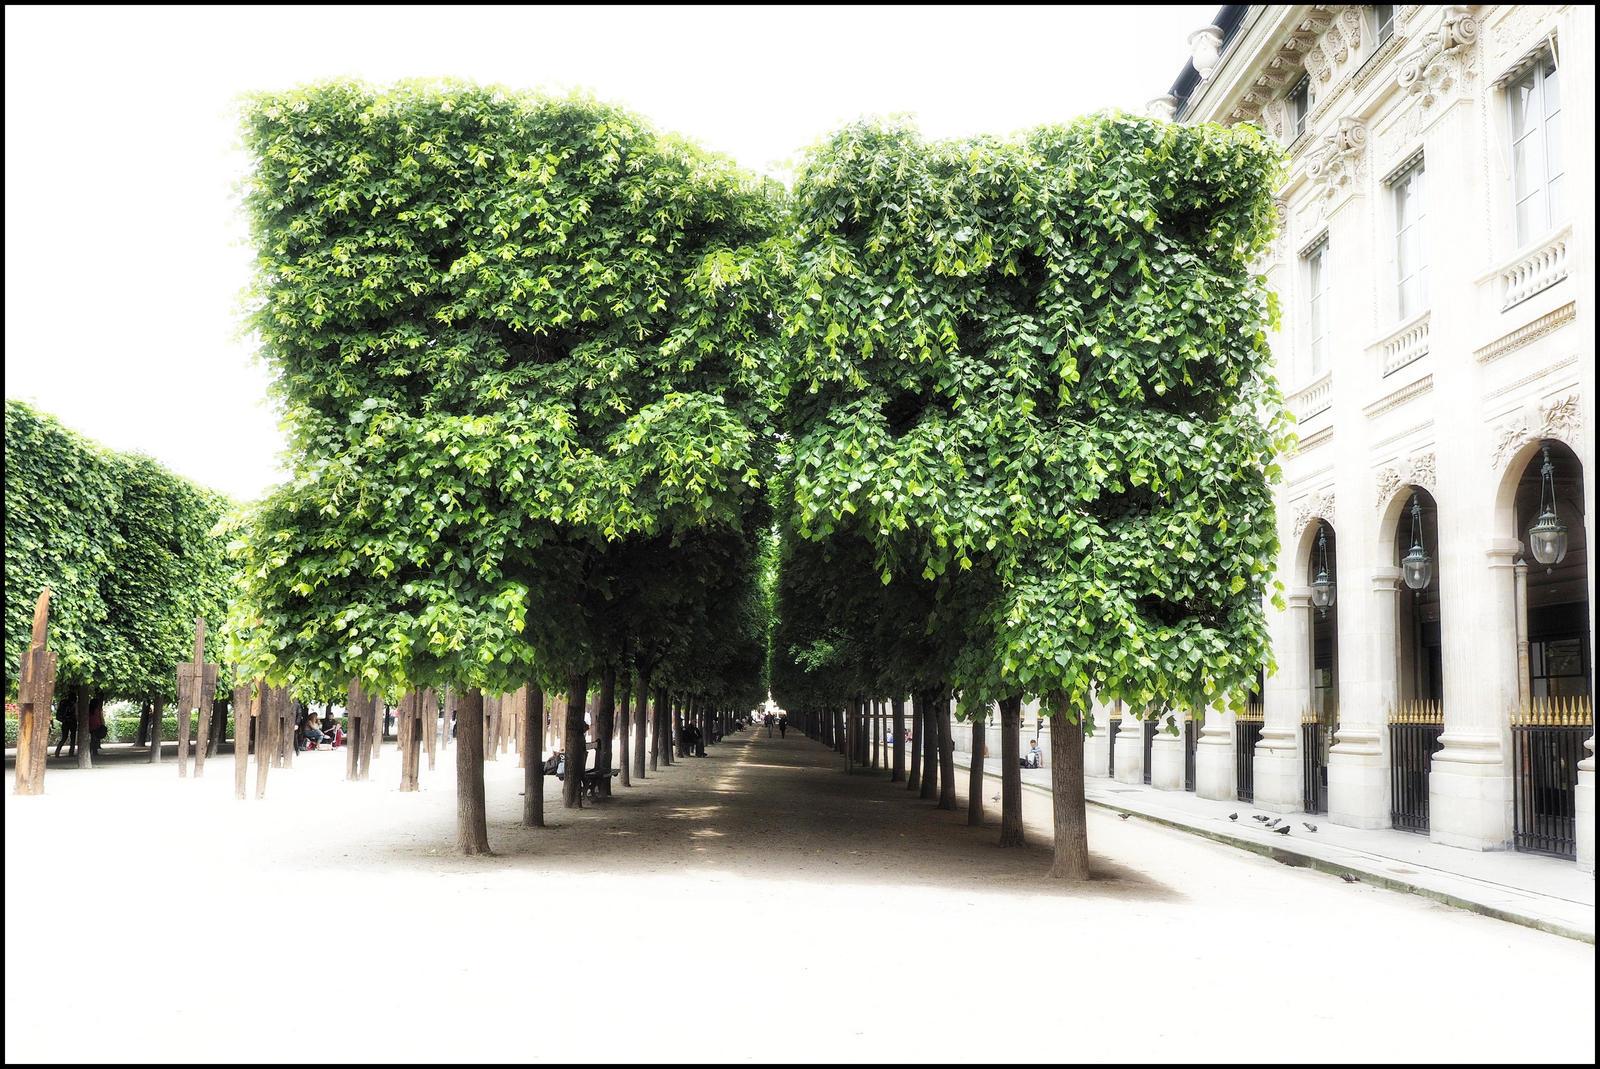 Jardin du palais royal by sudor on deviantart for Art du jardin zbinden sa